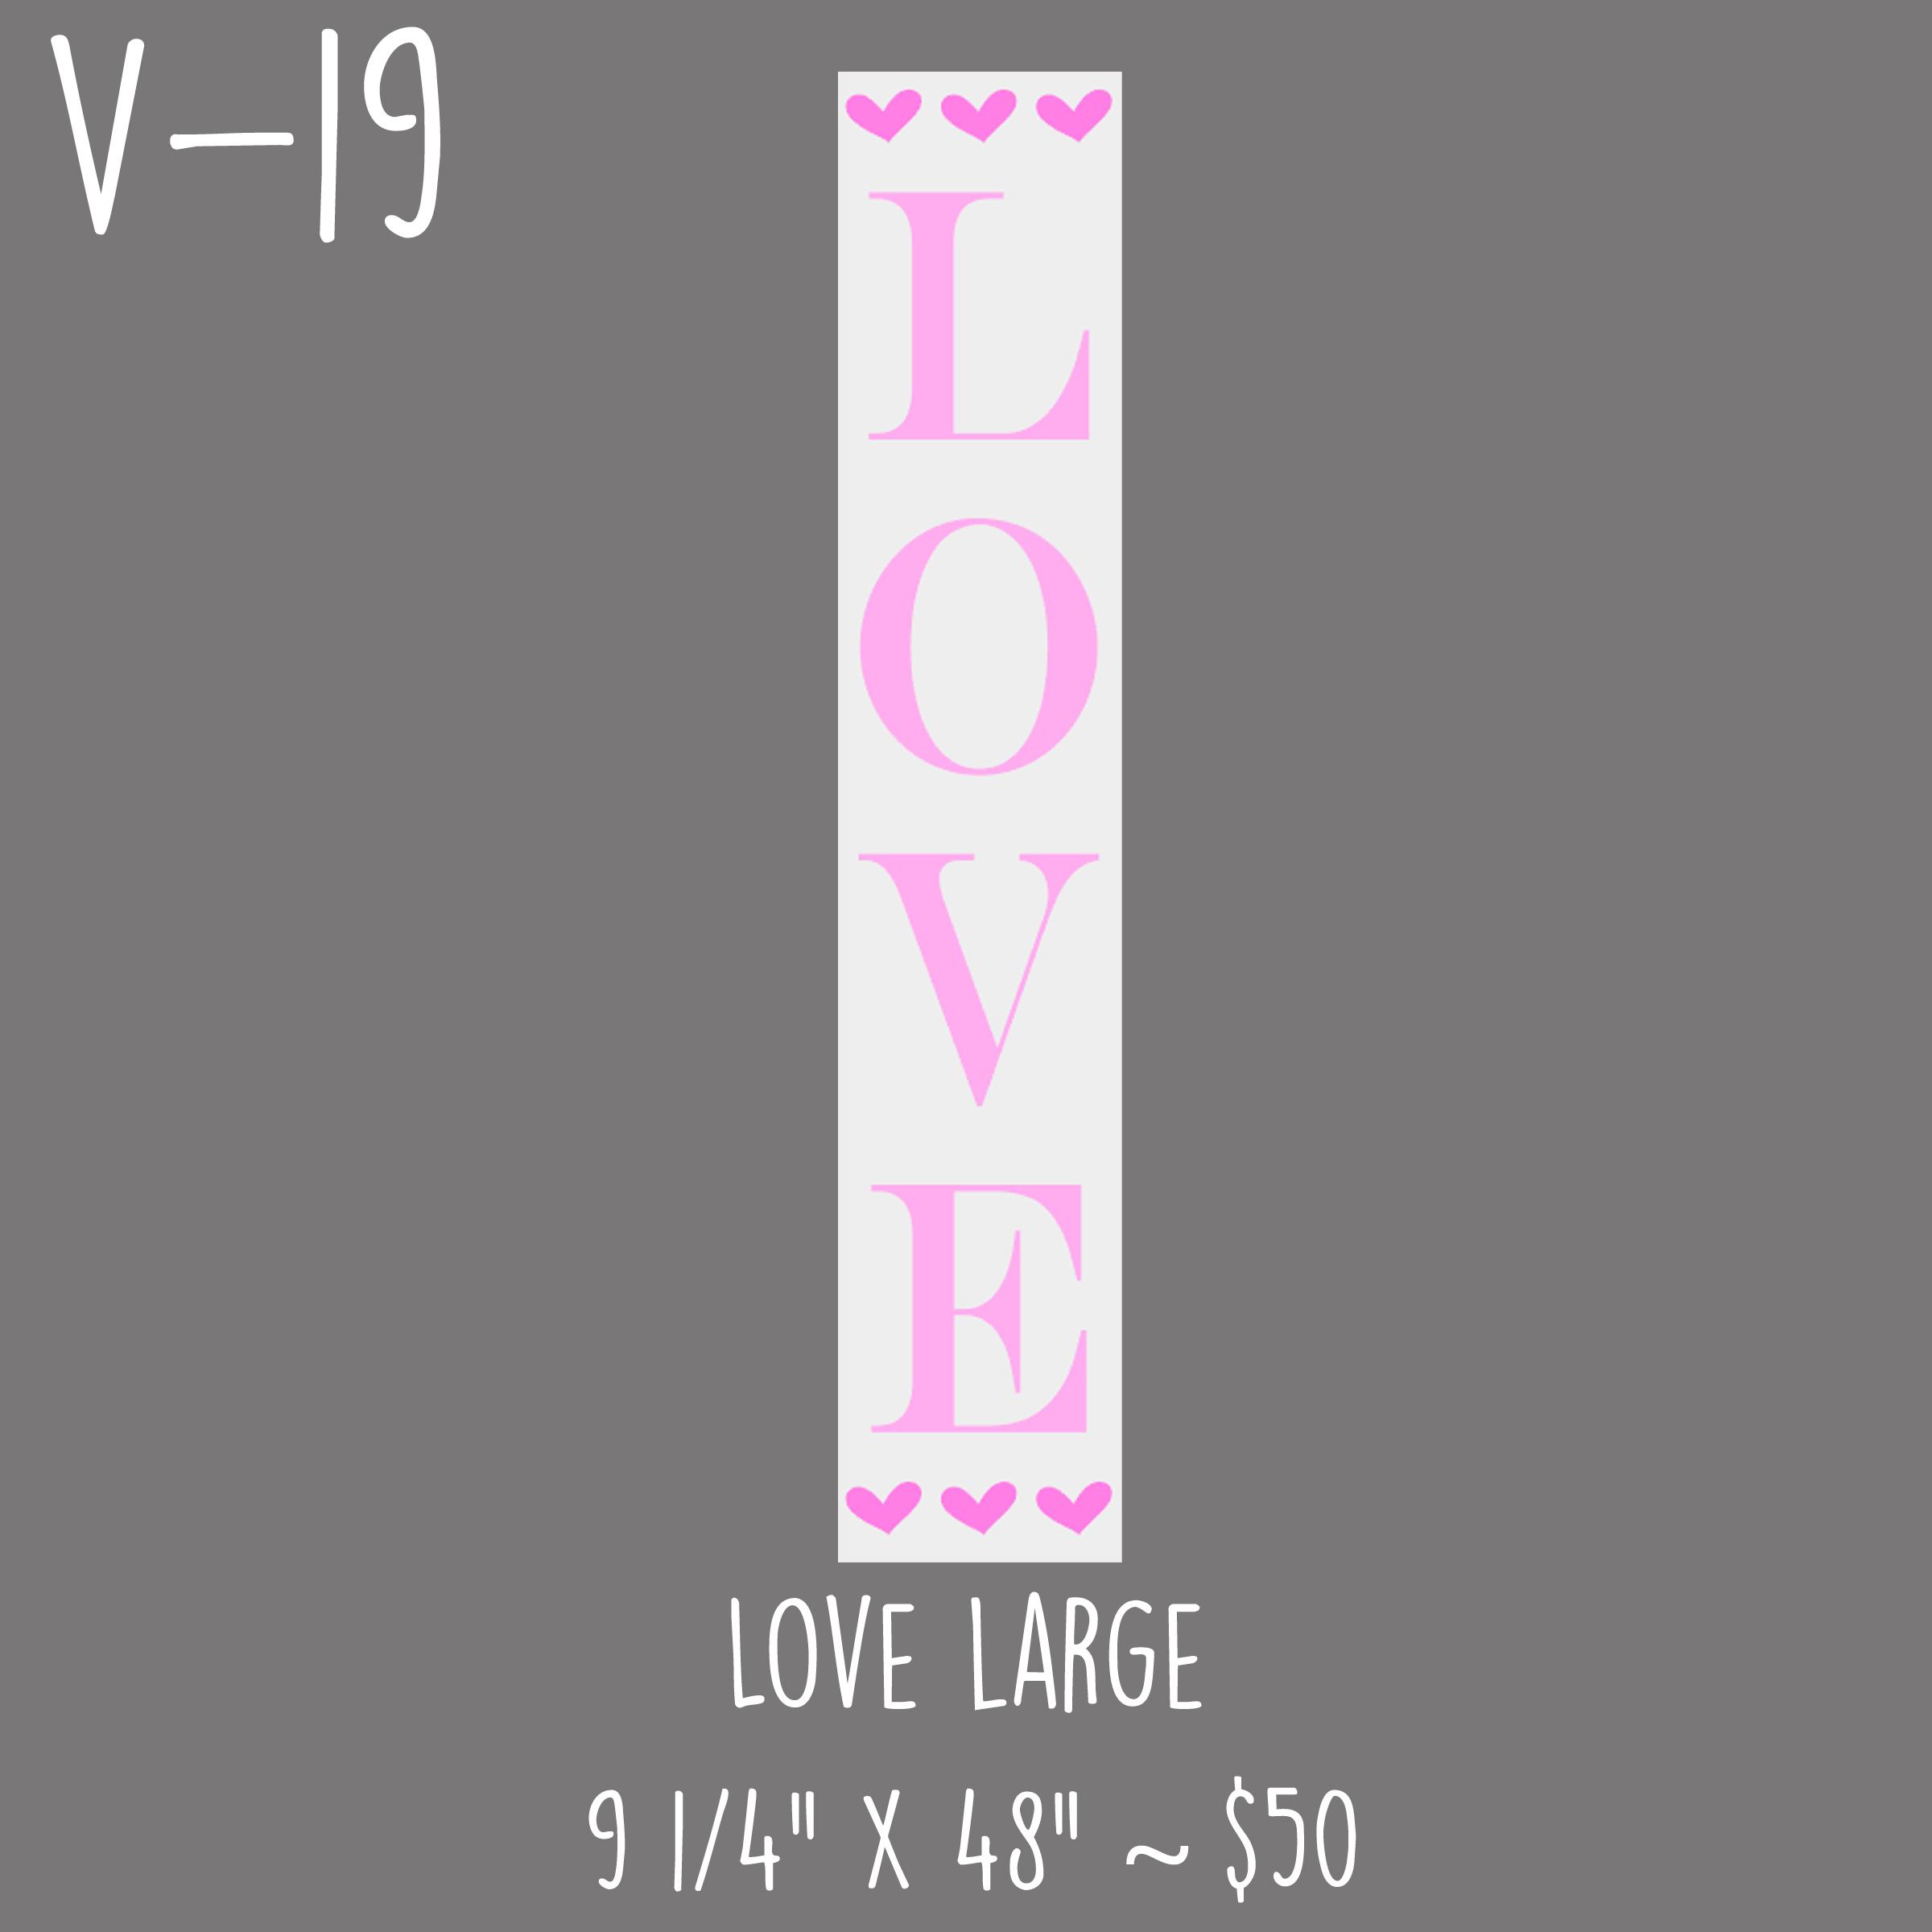 V19 - Love Large.jpg